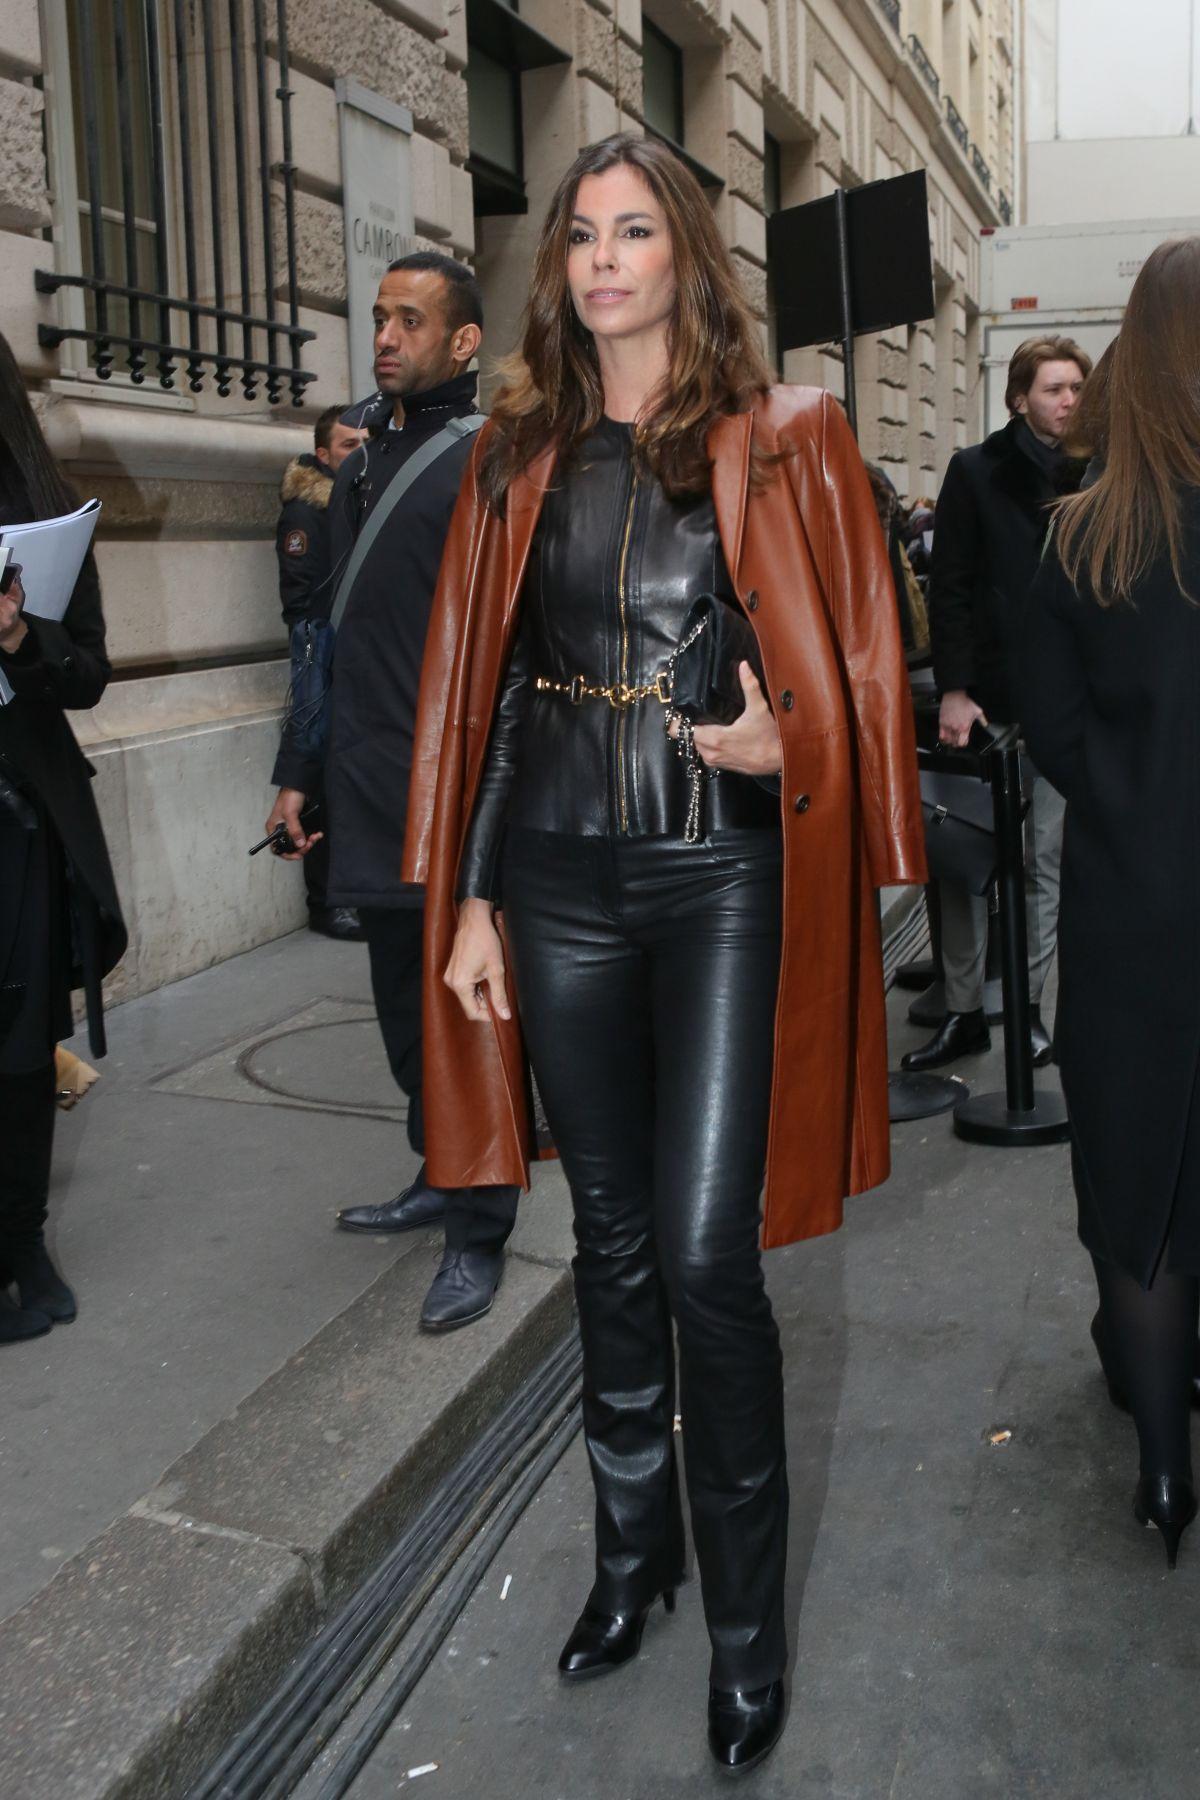 CHRISTINA PITANGUY at Elie Saab Fashion Show in Paris 01/25/2017